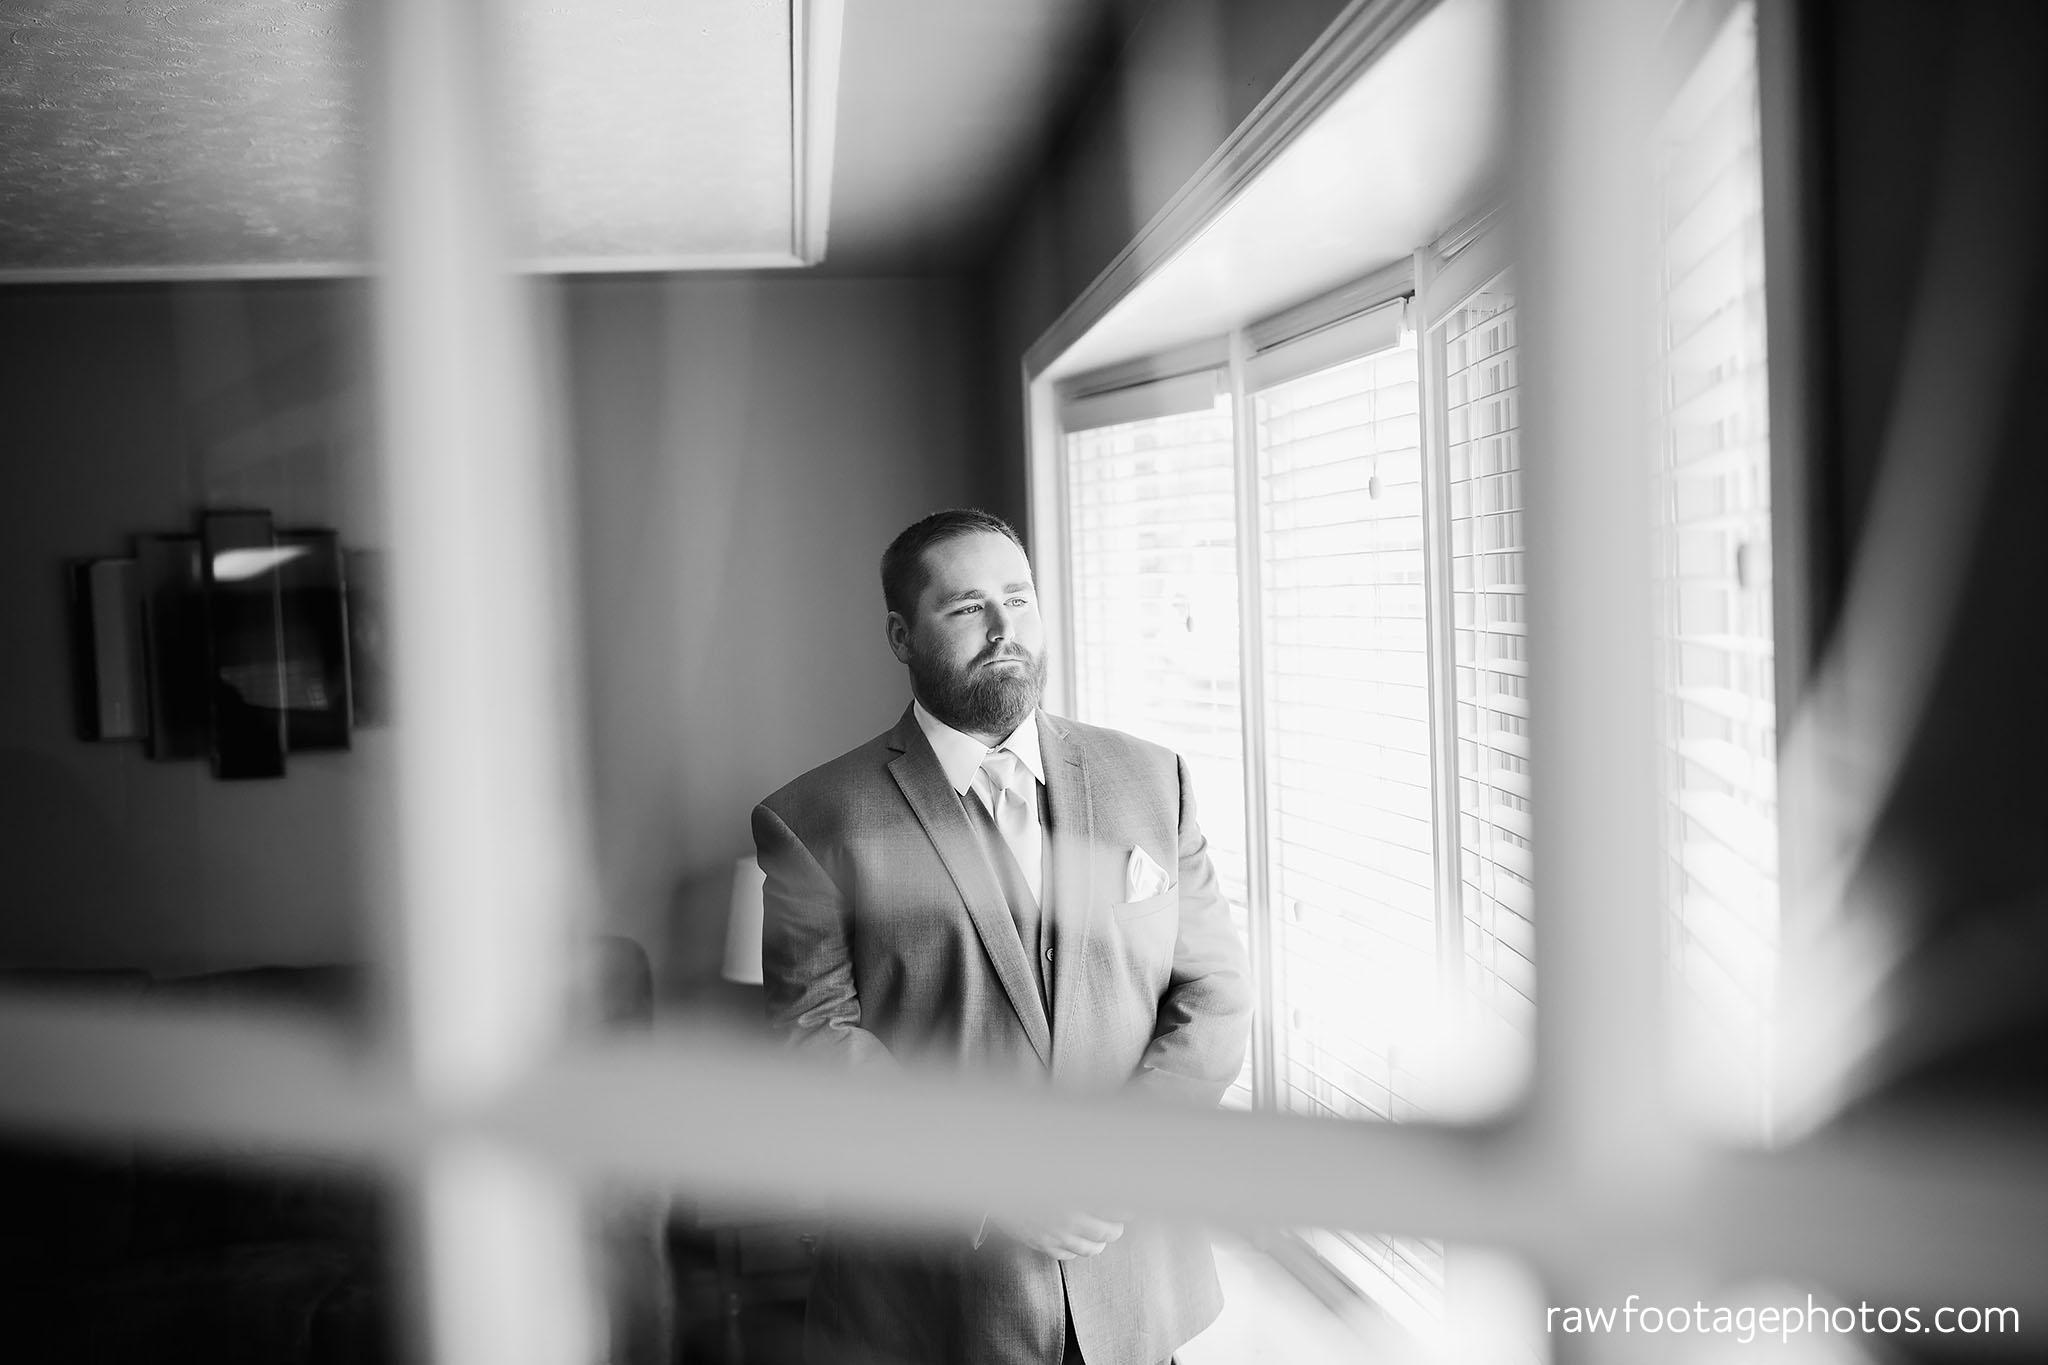 london_ontario_wedding_photographer-century_wedding_barn-raw_footage_photography-diy_wedding005.jpg